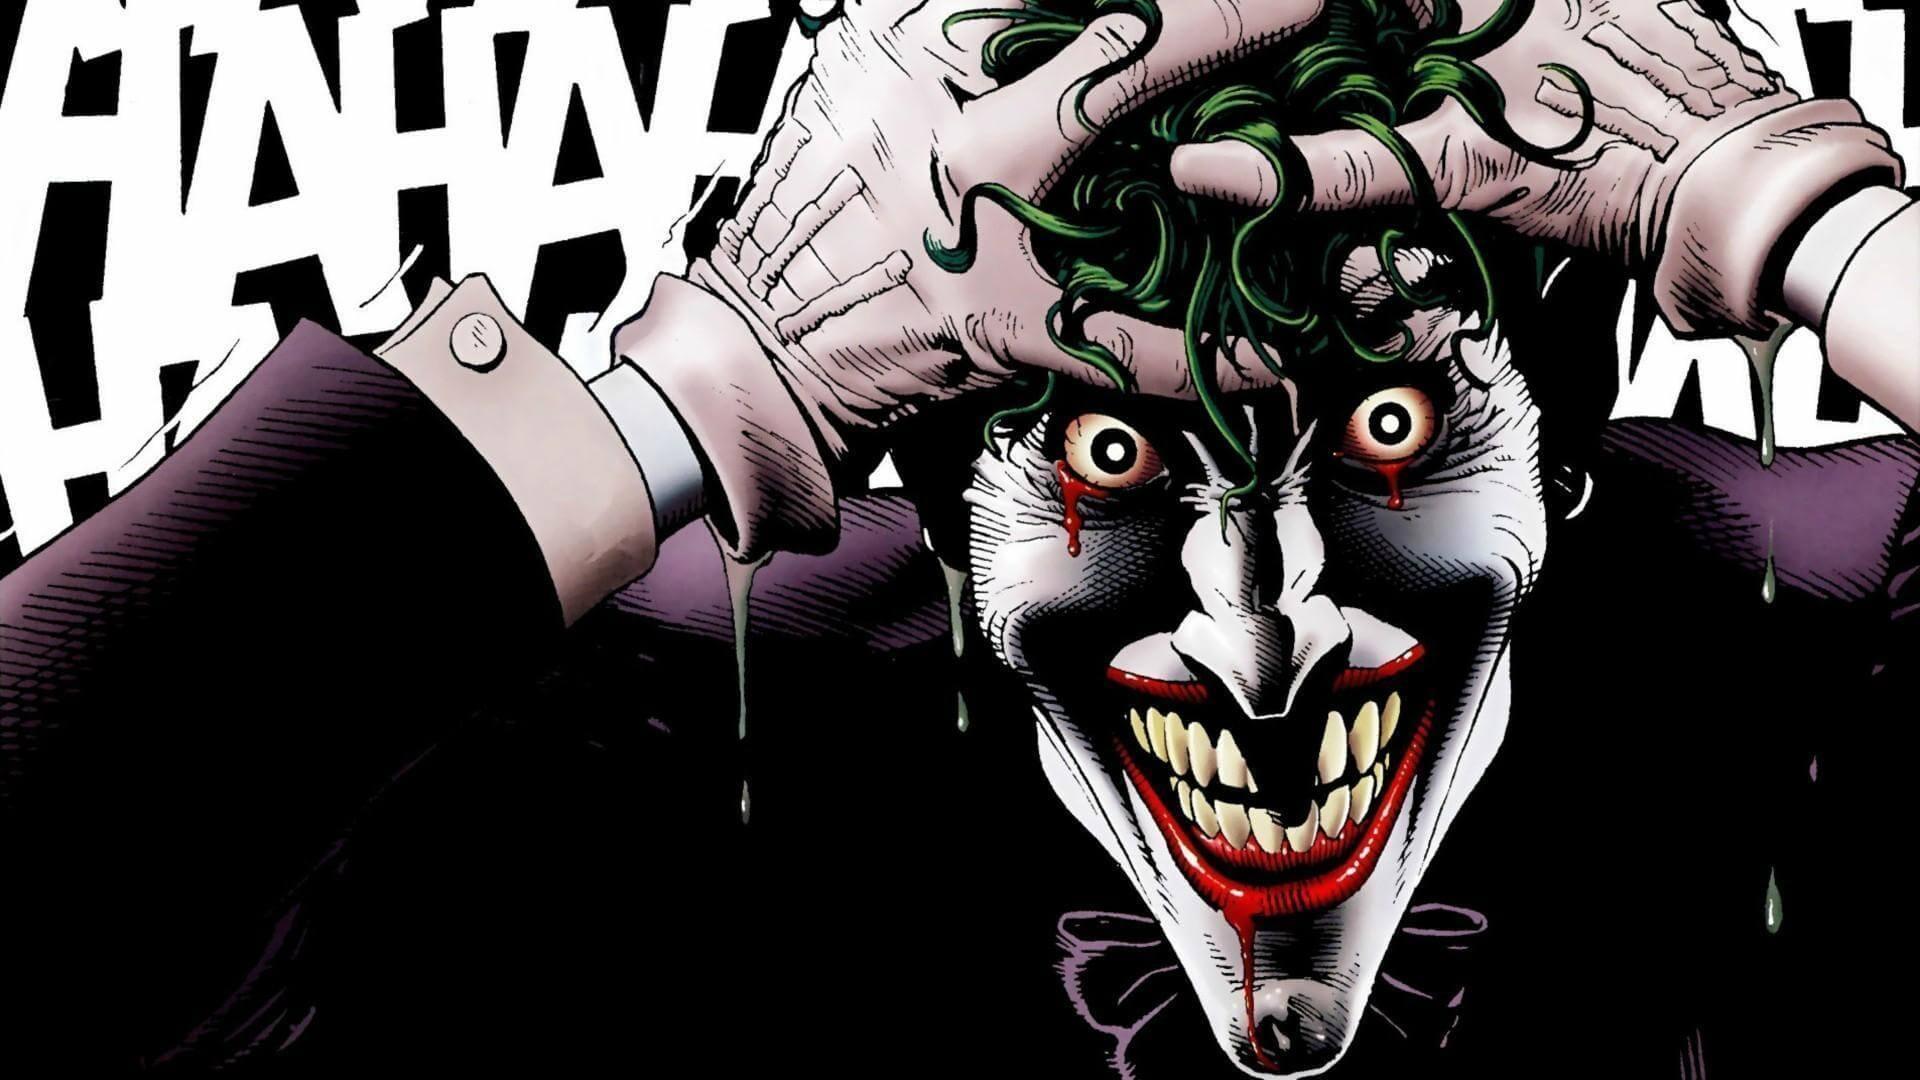 Joker Gets New DC Comics Series